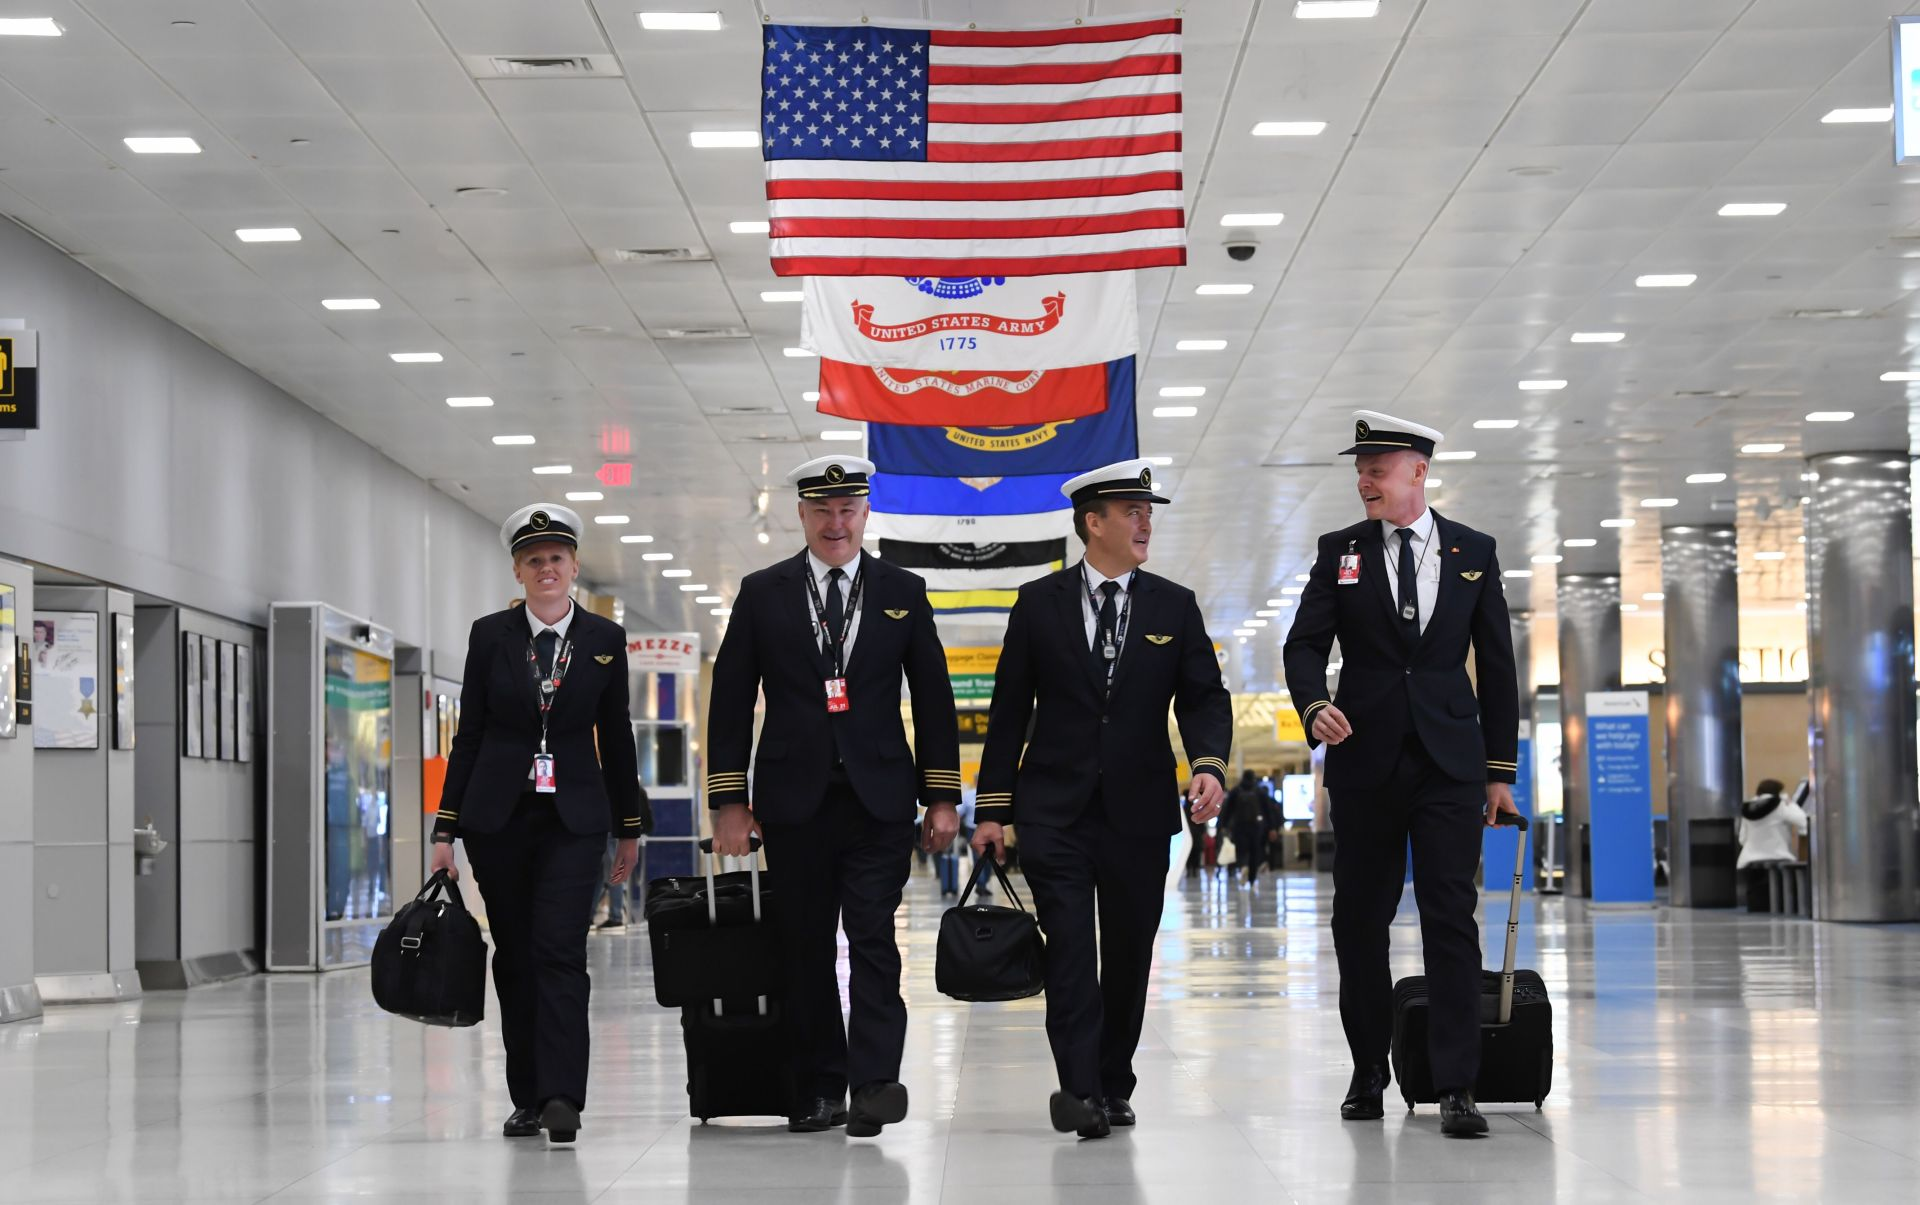 Posádka letu QF7879 před odletem z New Yorku. Foto: James D Morgan / Qantas